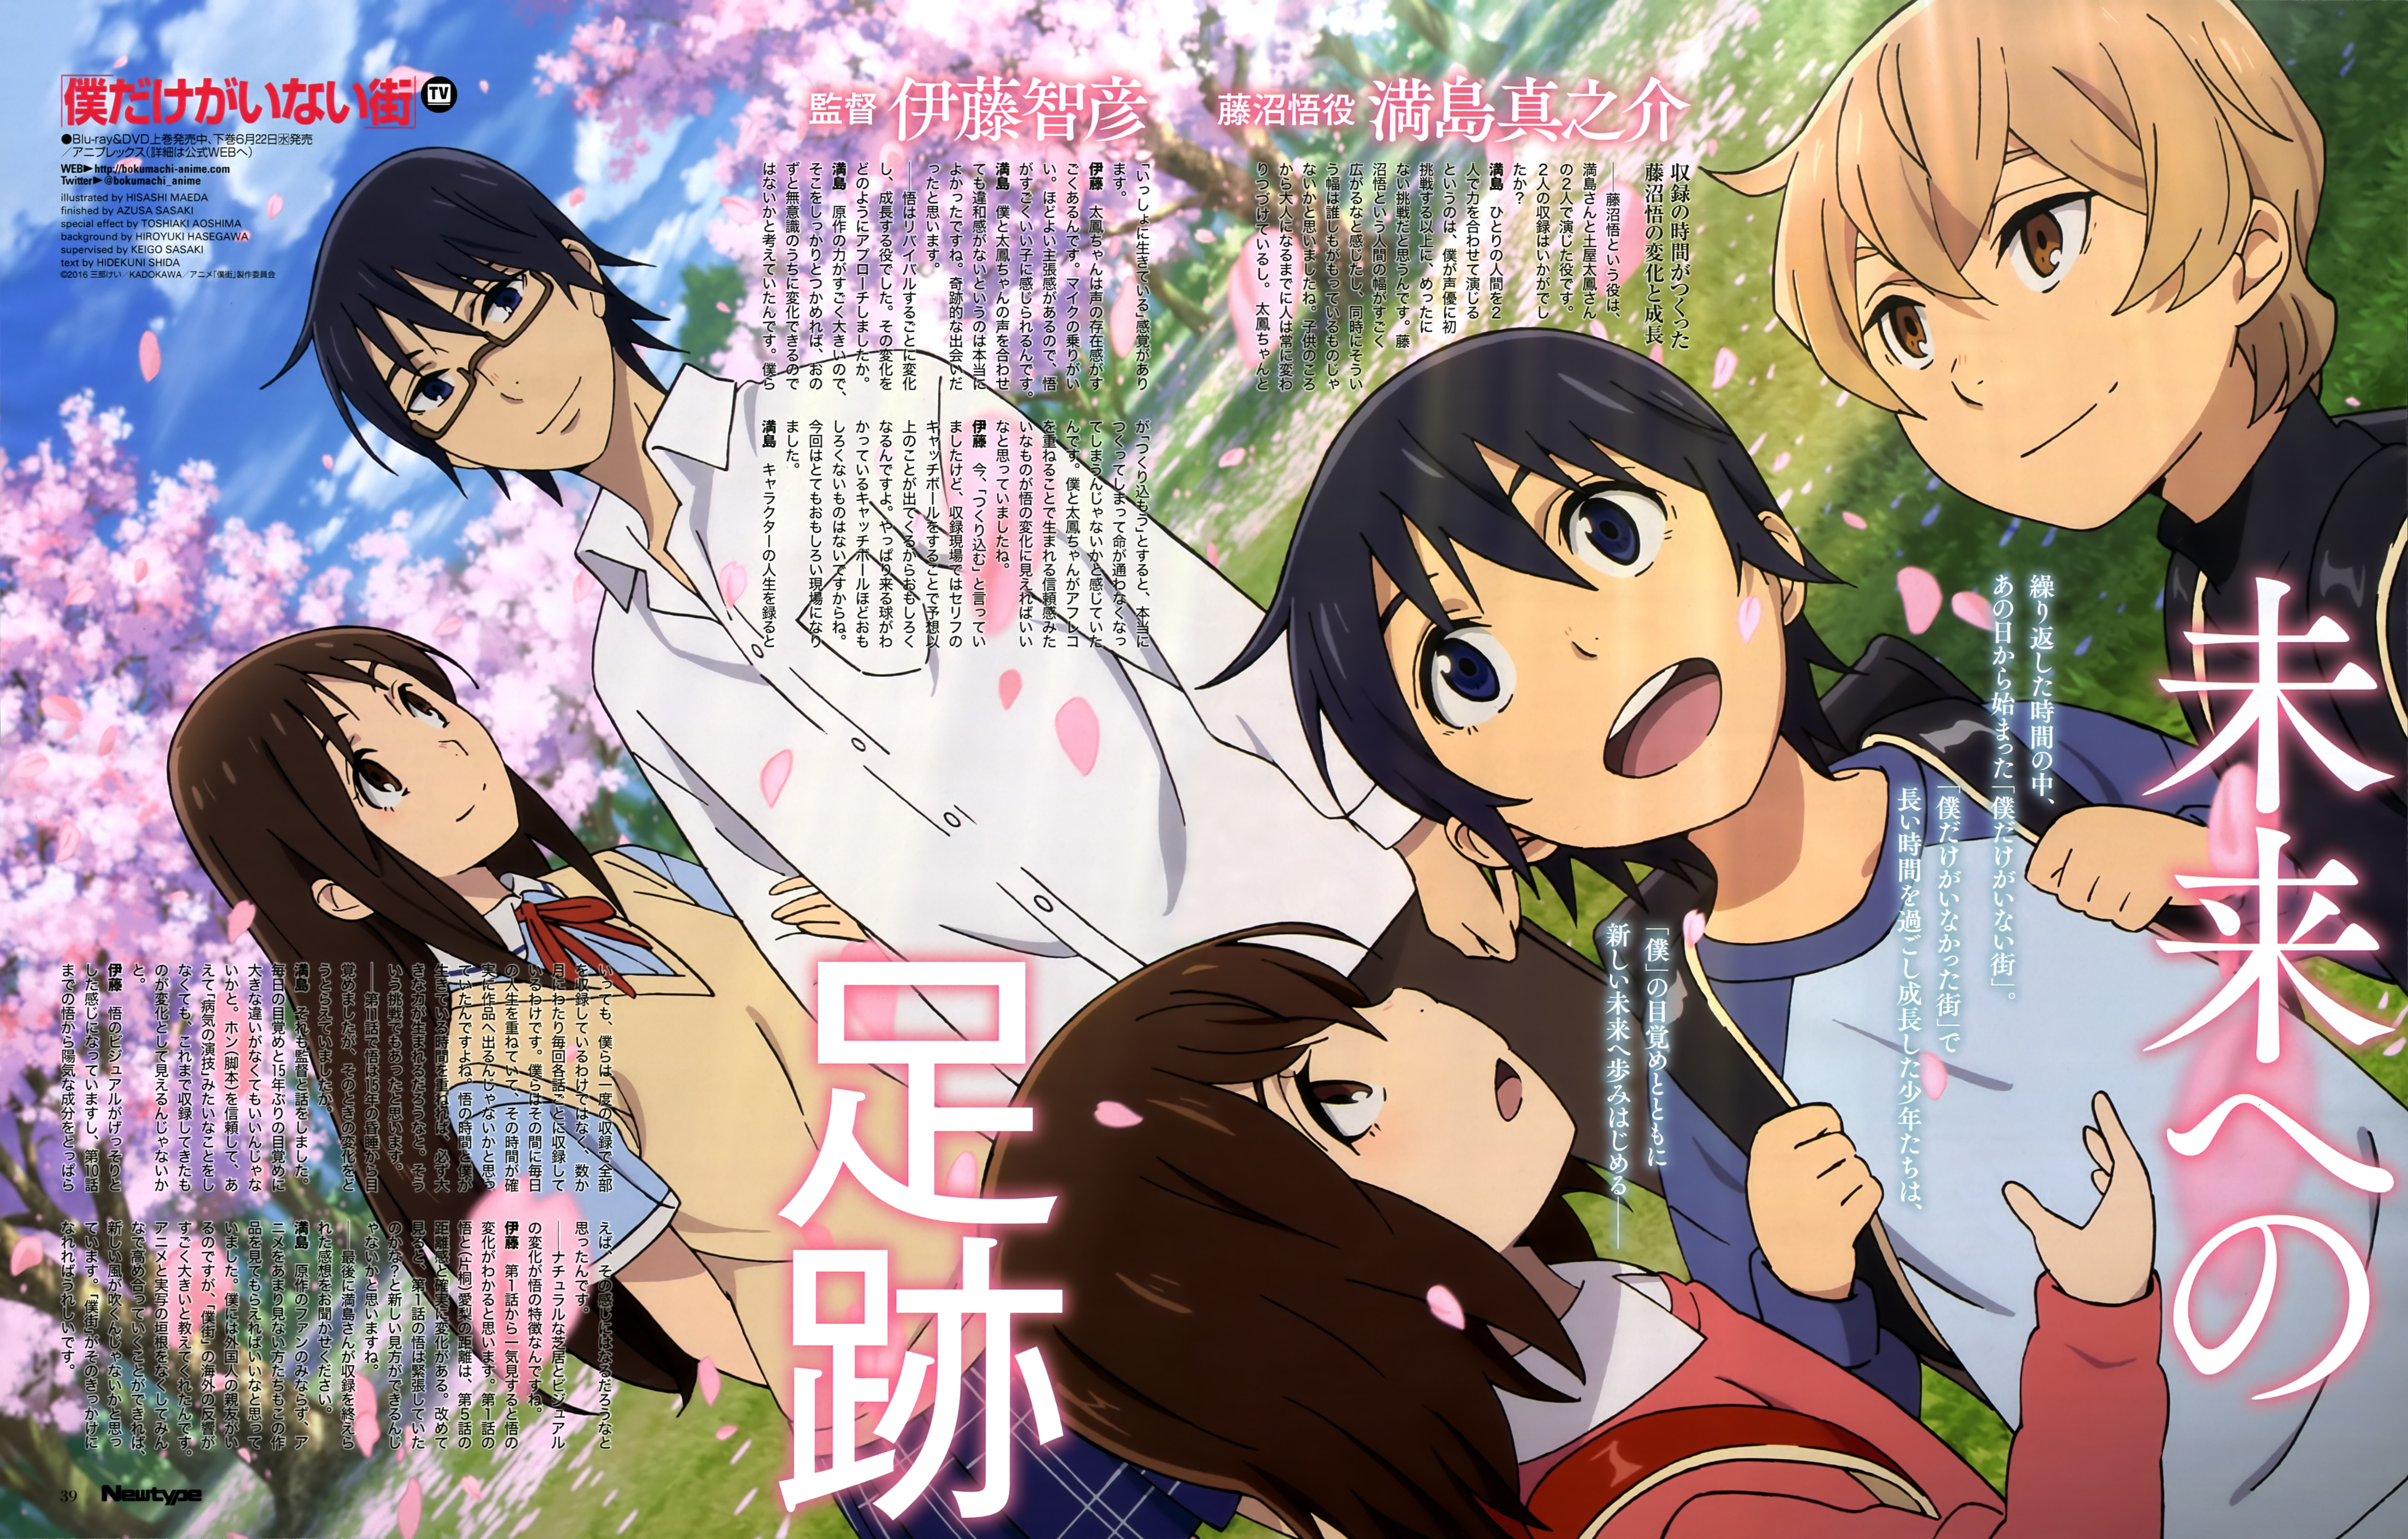 Wonderful Boku dake ga Inai Machi Visual Revealed